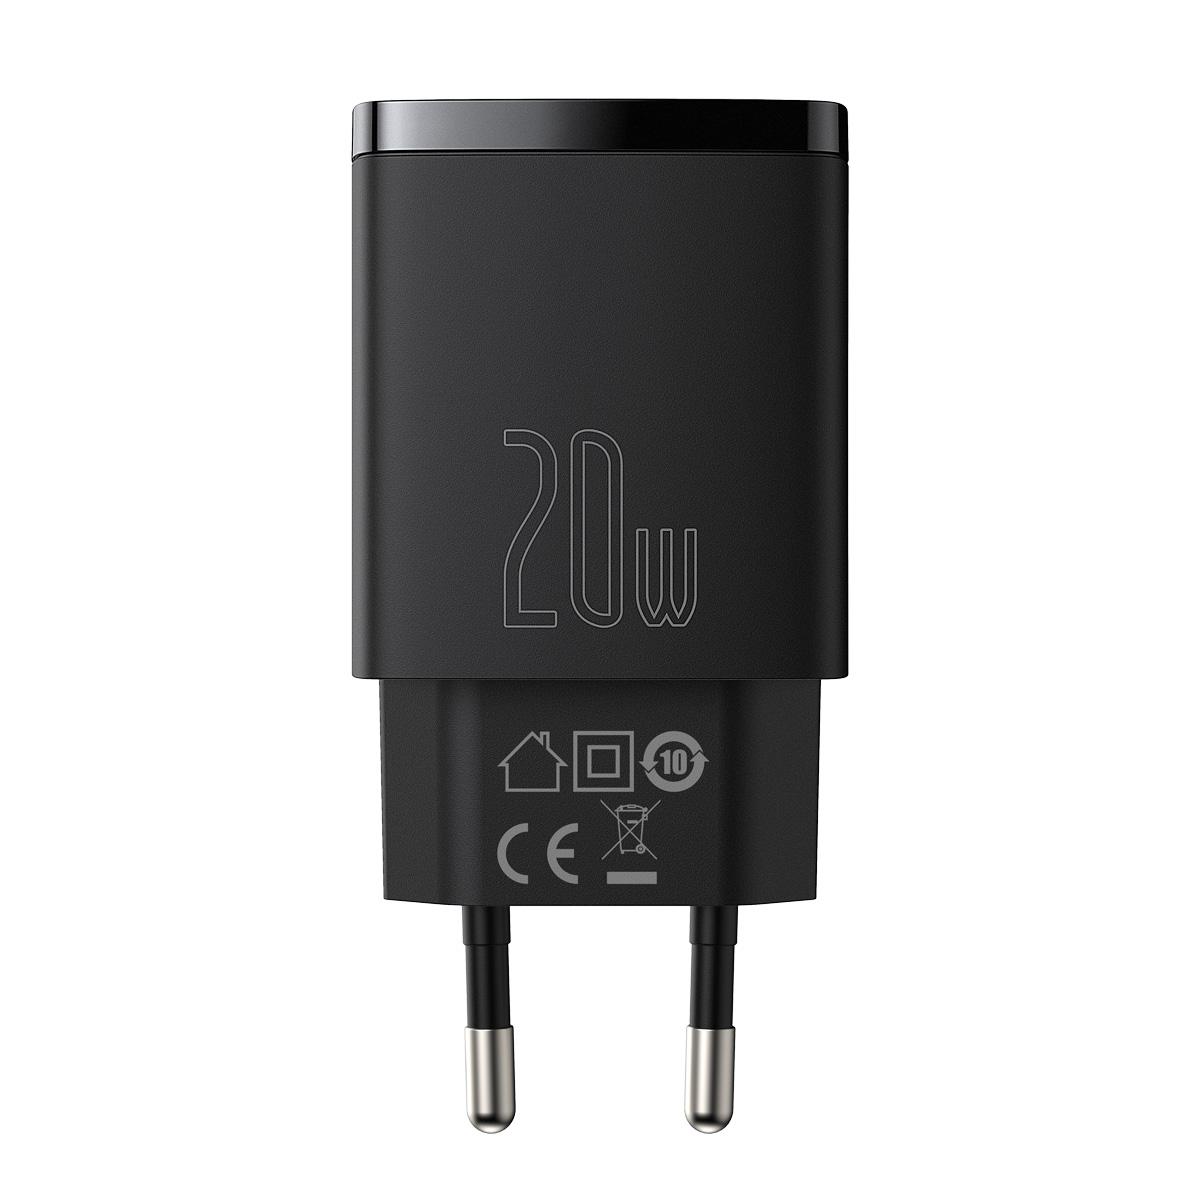 Carregador de Parede Baseus USB + TYPE-C Compact QC 3.0 PD 20W